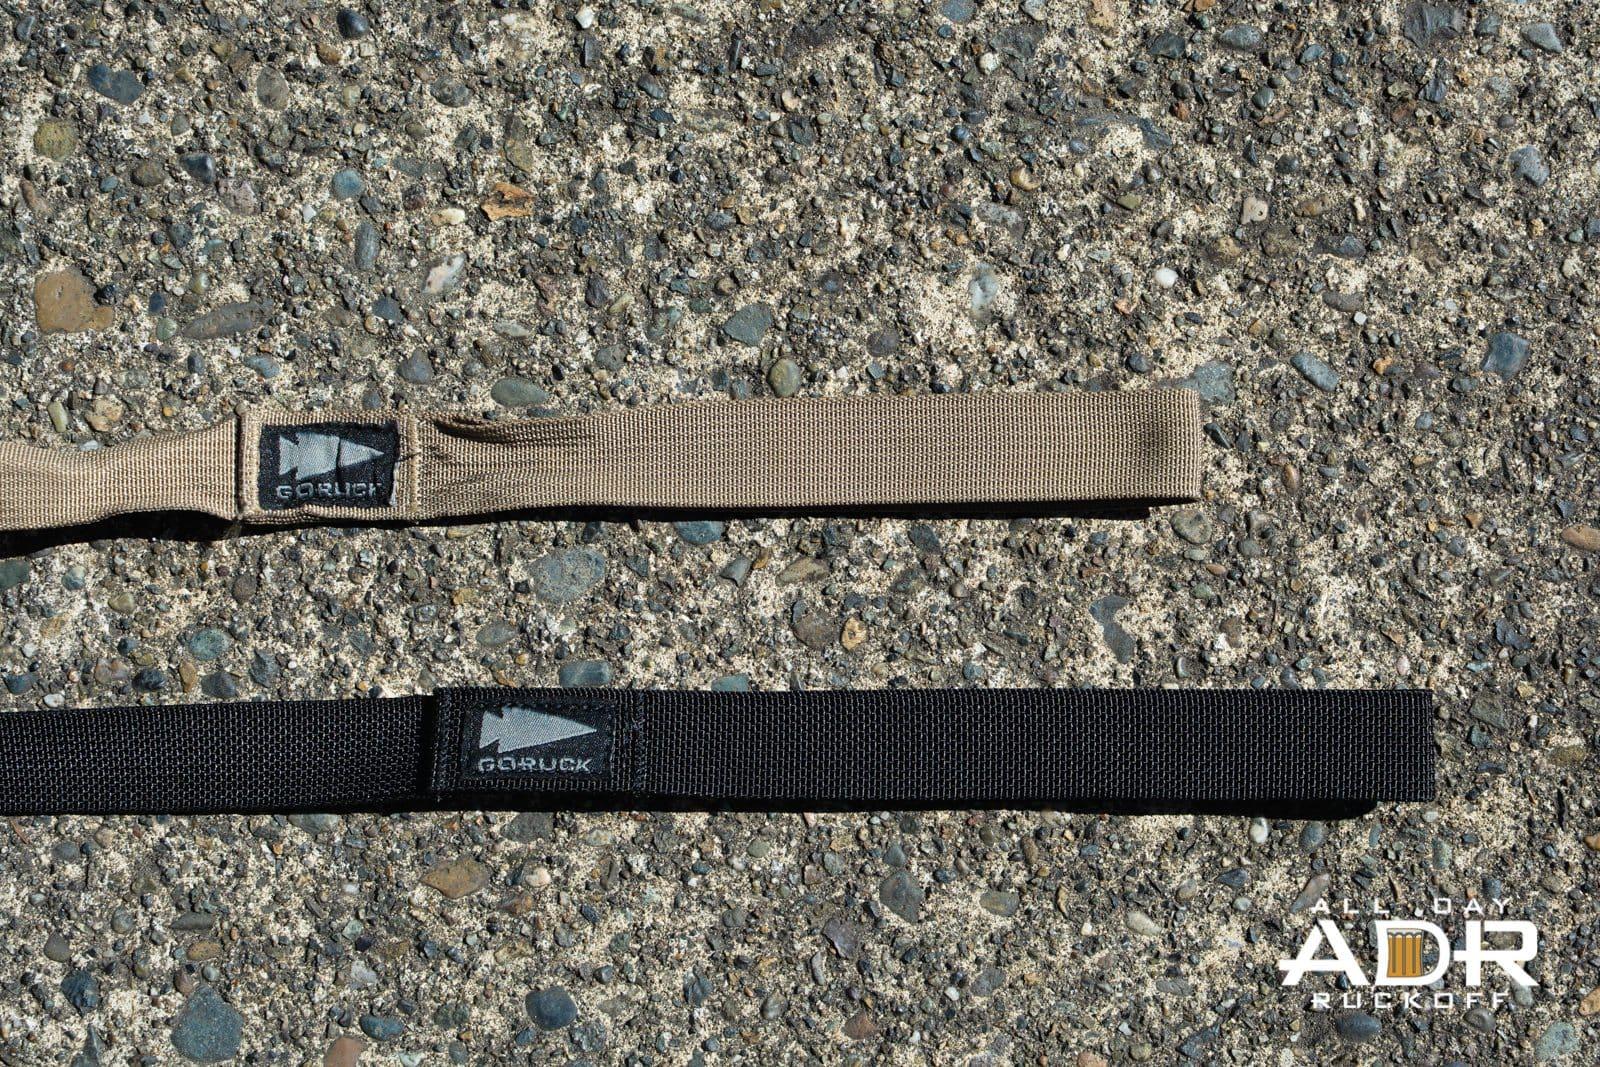 GORUCK Dog Leash Comparison Length